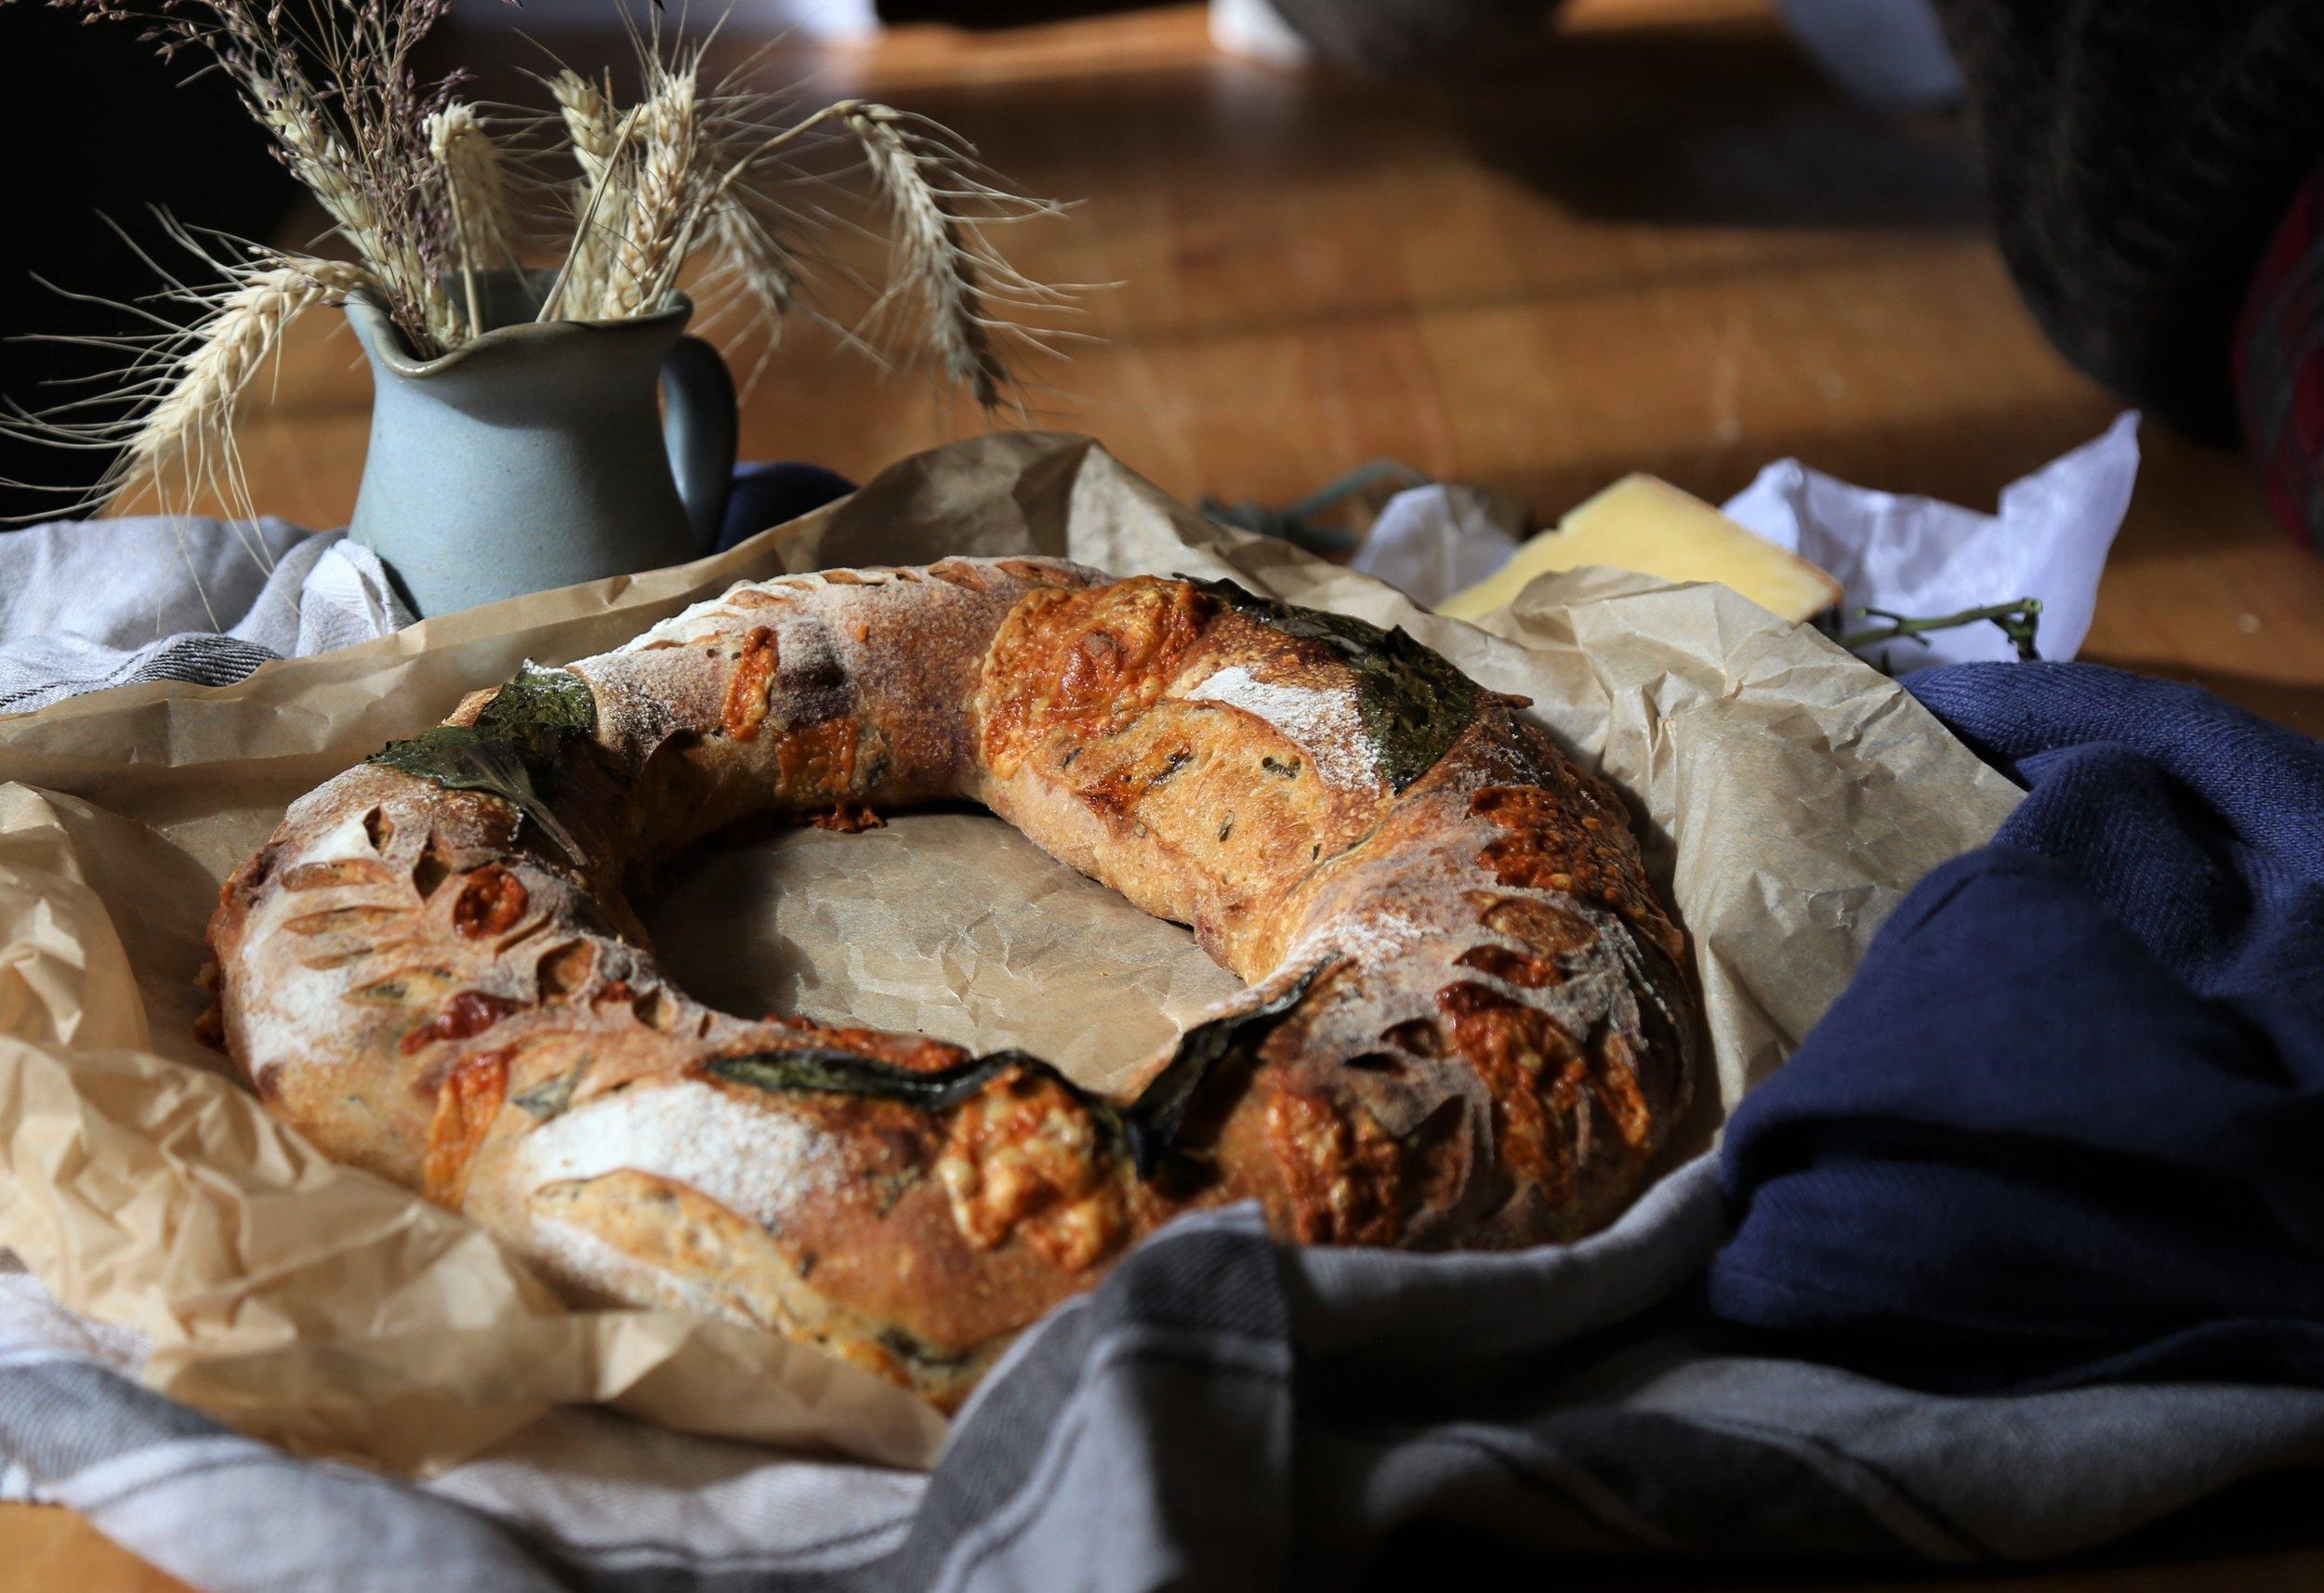 Rustic wild garlic picnic bread 1.jpg